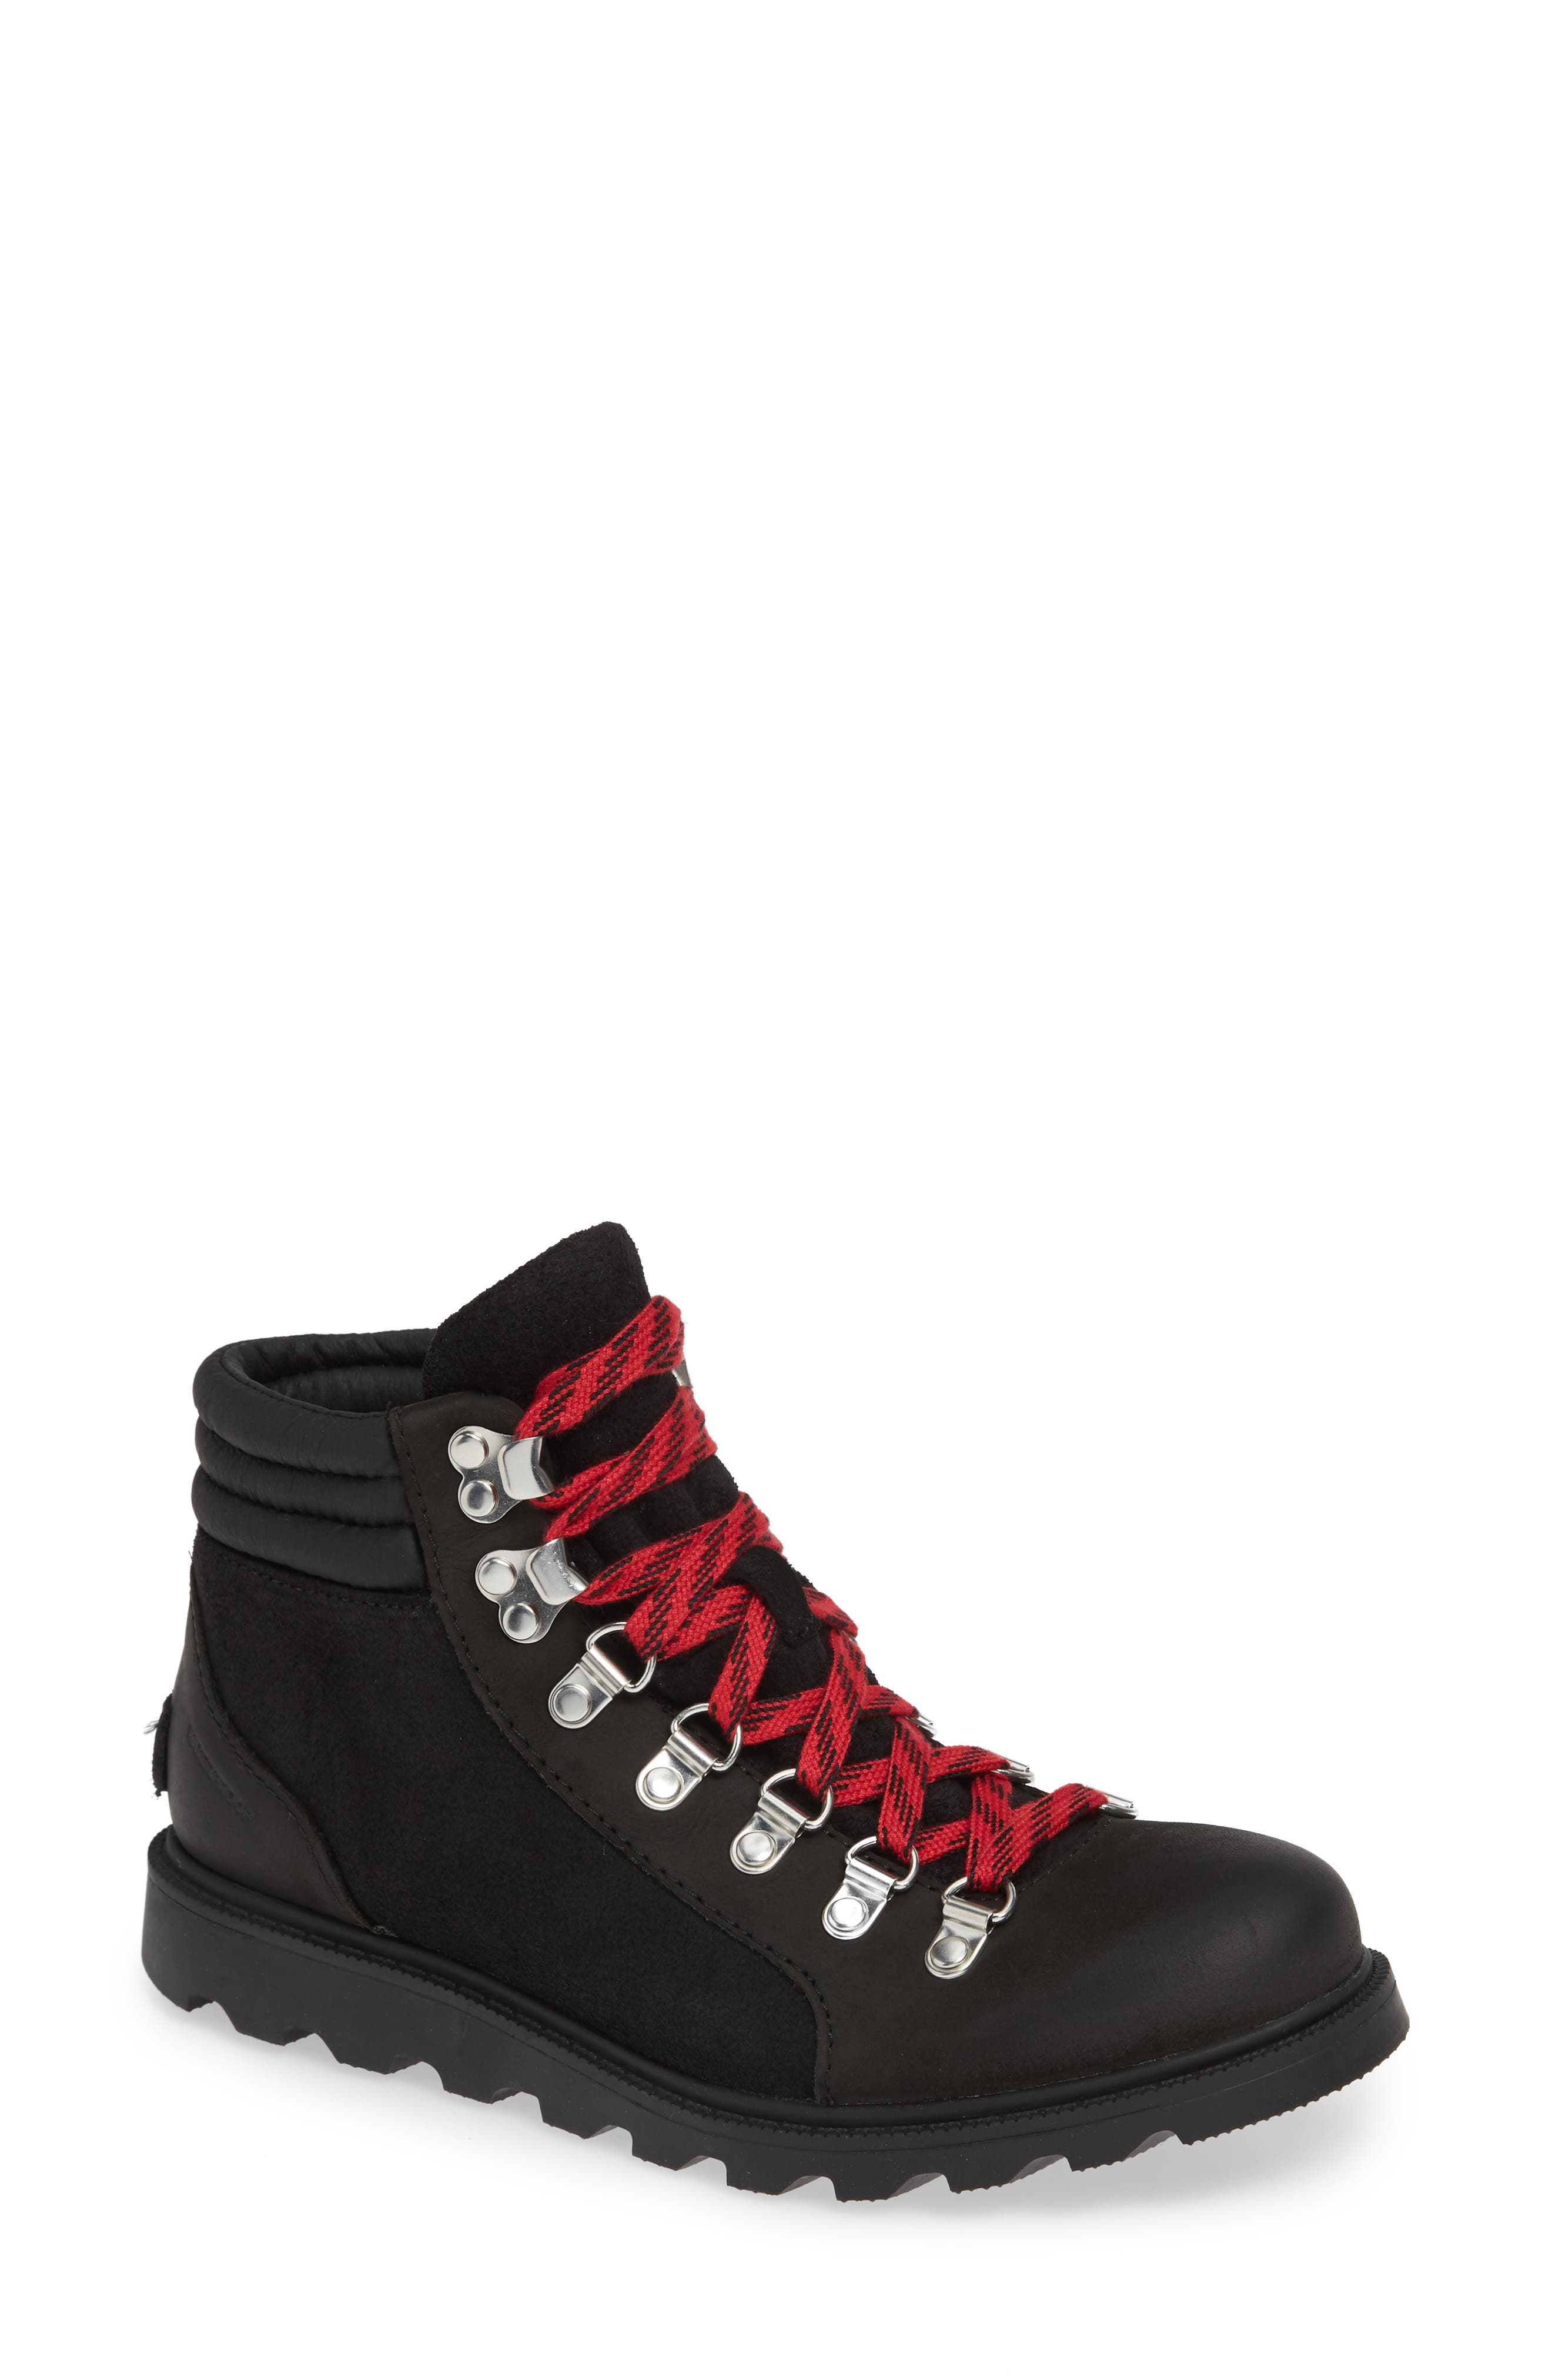 SOREL, Ainsley Conquest Waterproof Boot, Main thumbnail 1, color, BLACK/ BLACK